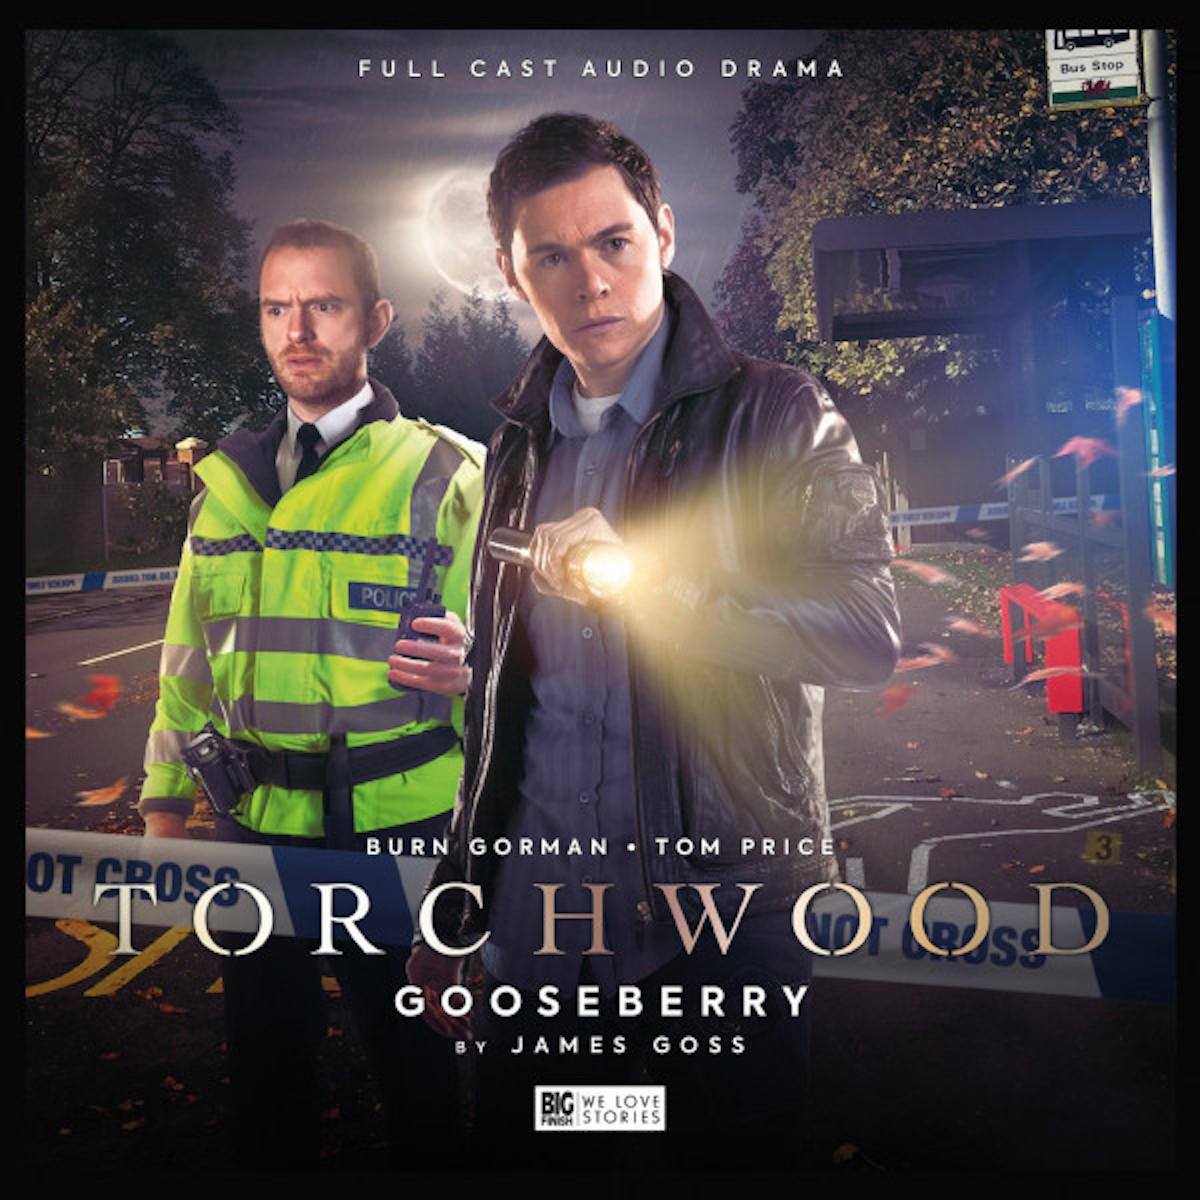 Torchwood Gooseberry